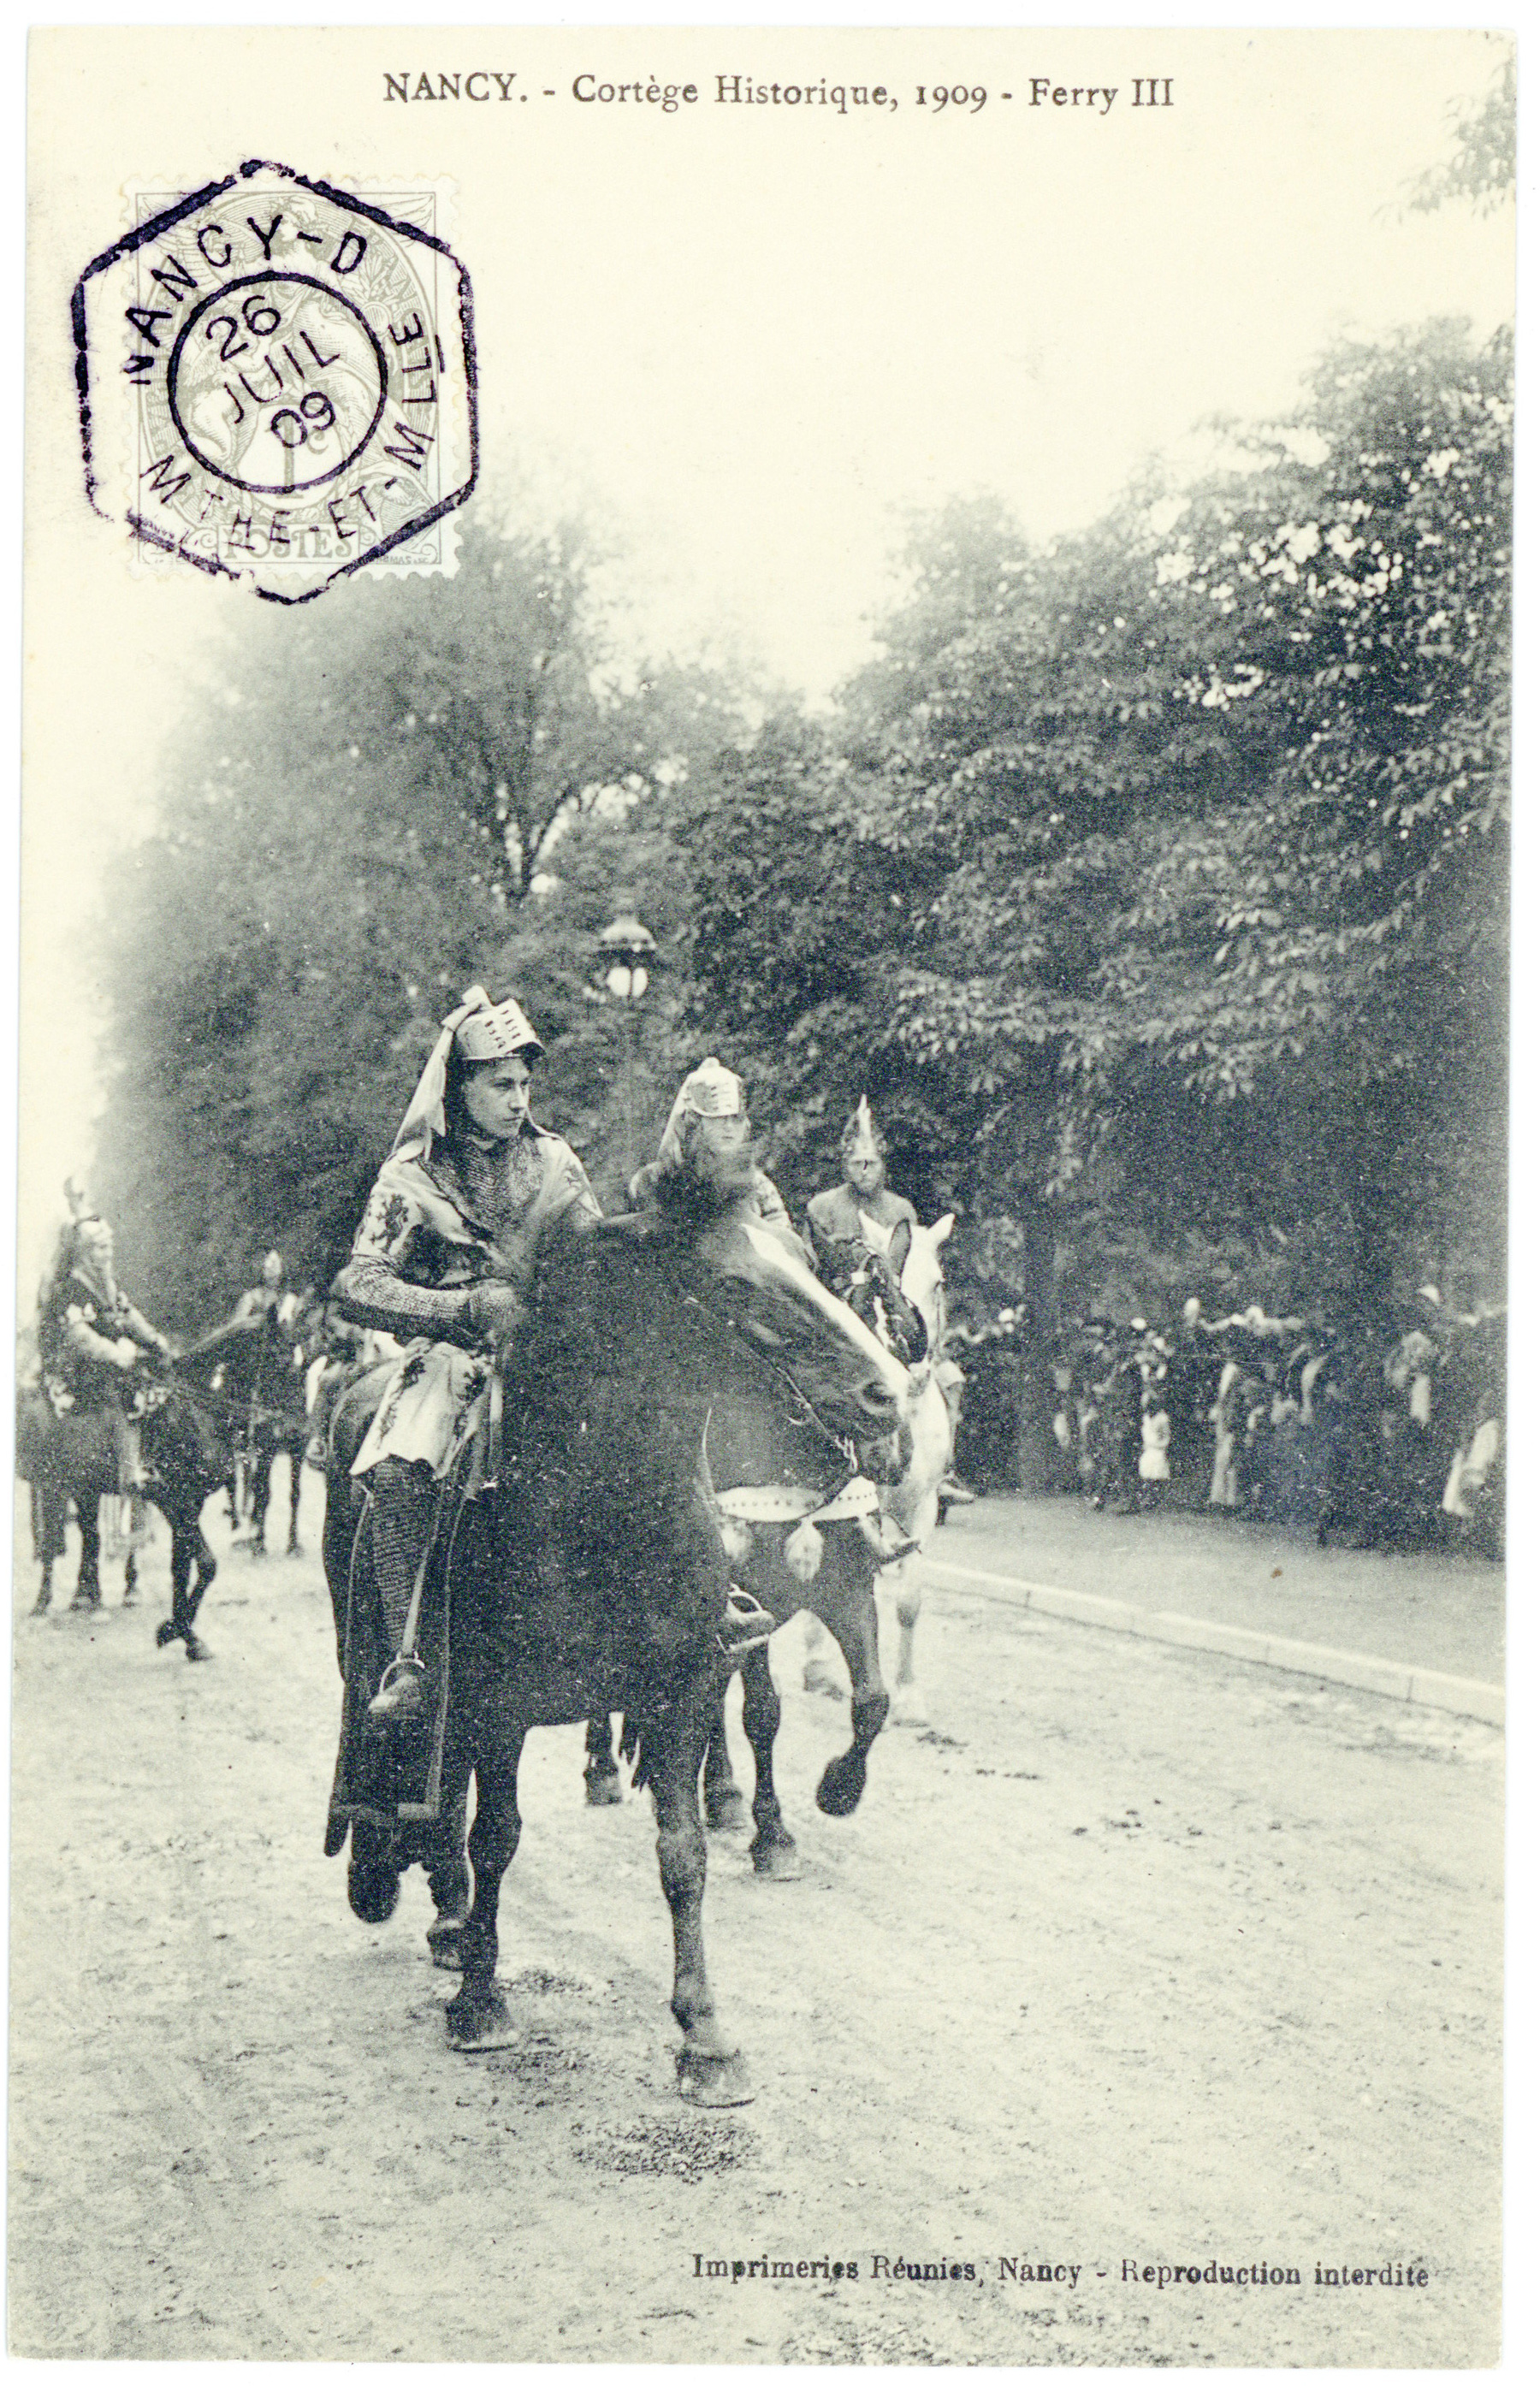 Contenu du Ferry III  Nancy. - Cortège Historique, 1909